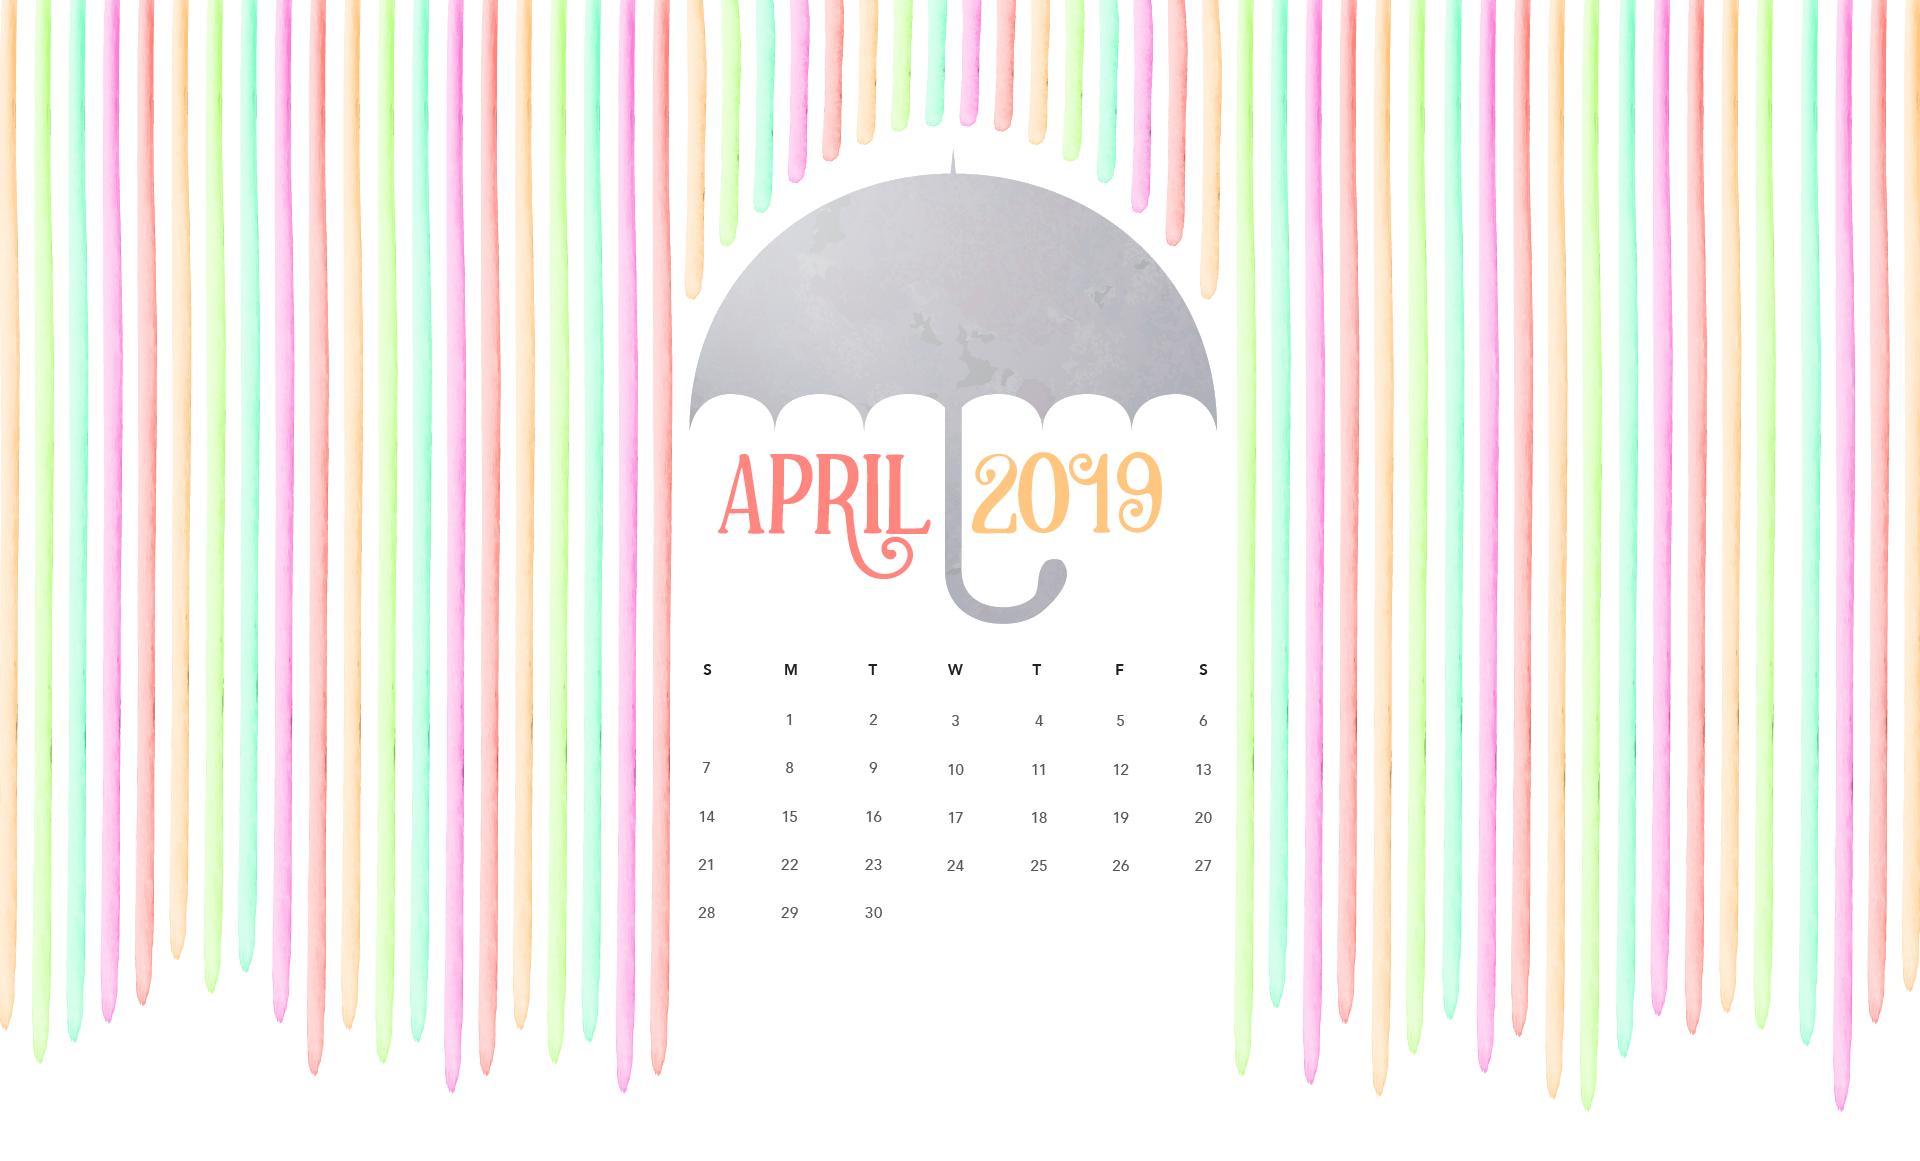 Beautiful April 2019 Calendar Wallpaper Desktop Wallpaper Calendar Calendar Wallpaper Calendar Design